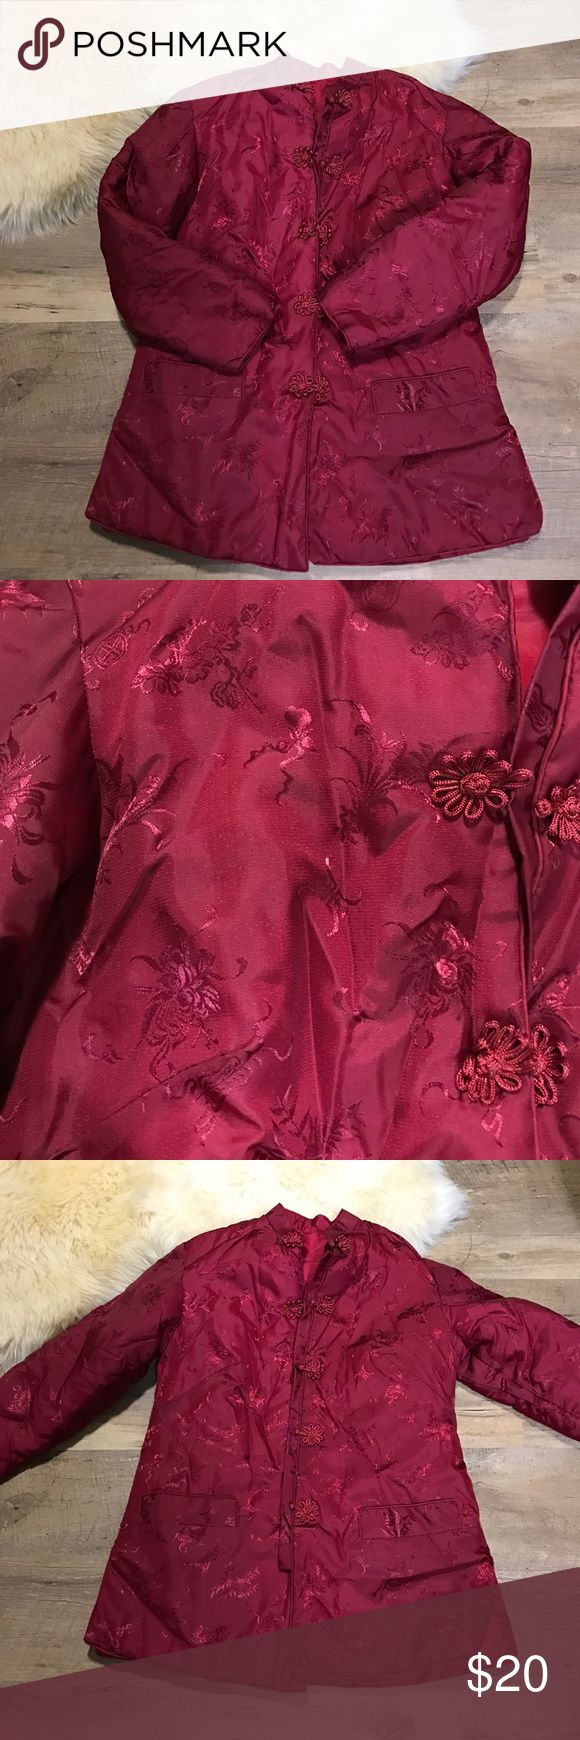 Chinese Cherry Blossom Satin Bomber Jacket Chinese Bomber Jacket. Not ASOS under it for exposure ASOS Jackets & Coats